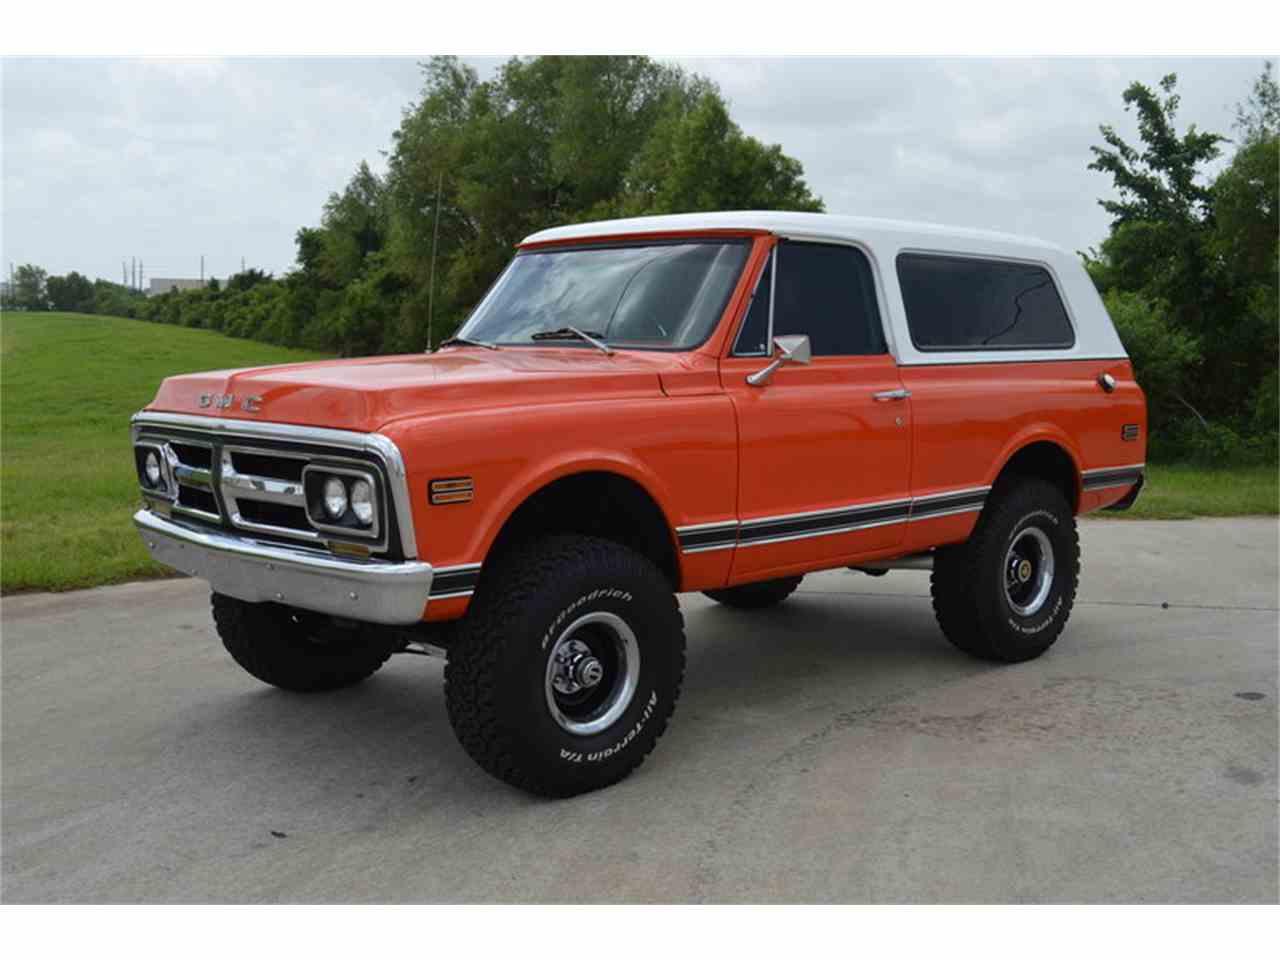 1972 Gmc Jimmy For Sale Classiccars Com Cc 1036677